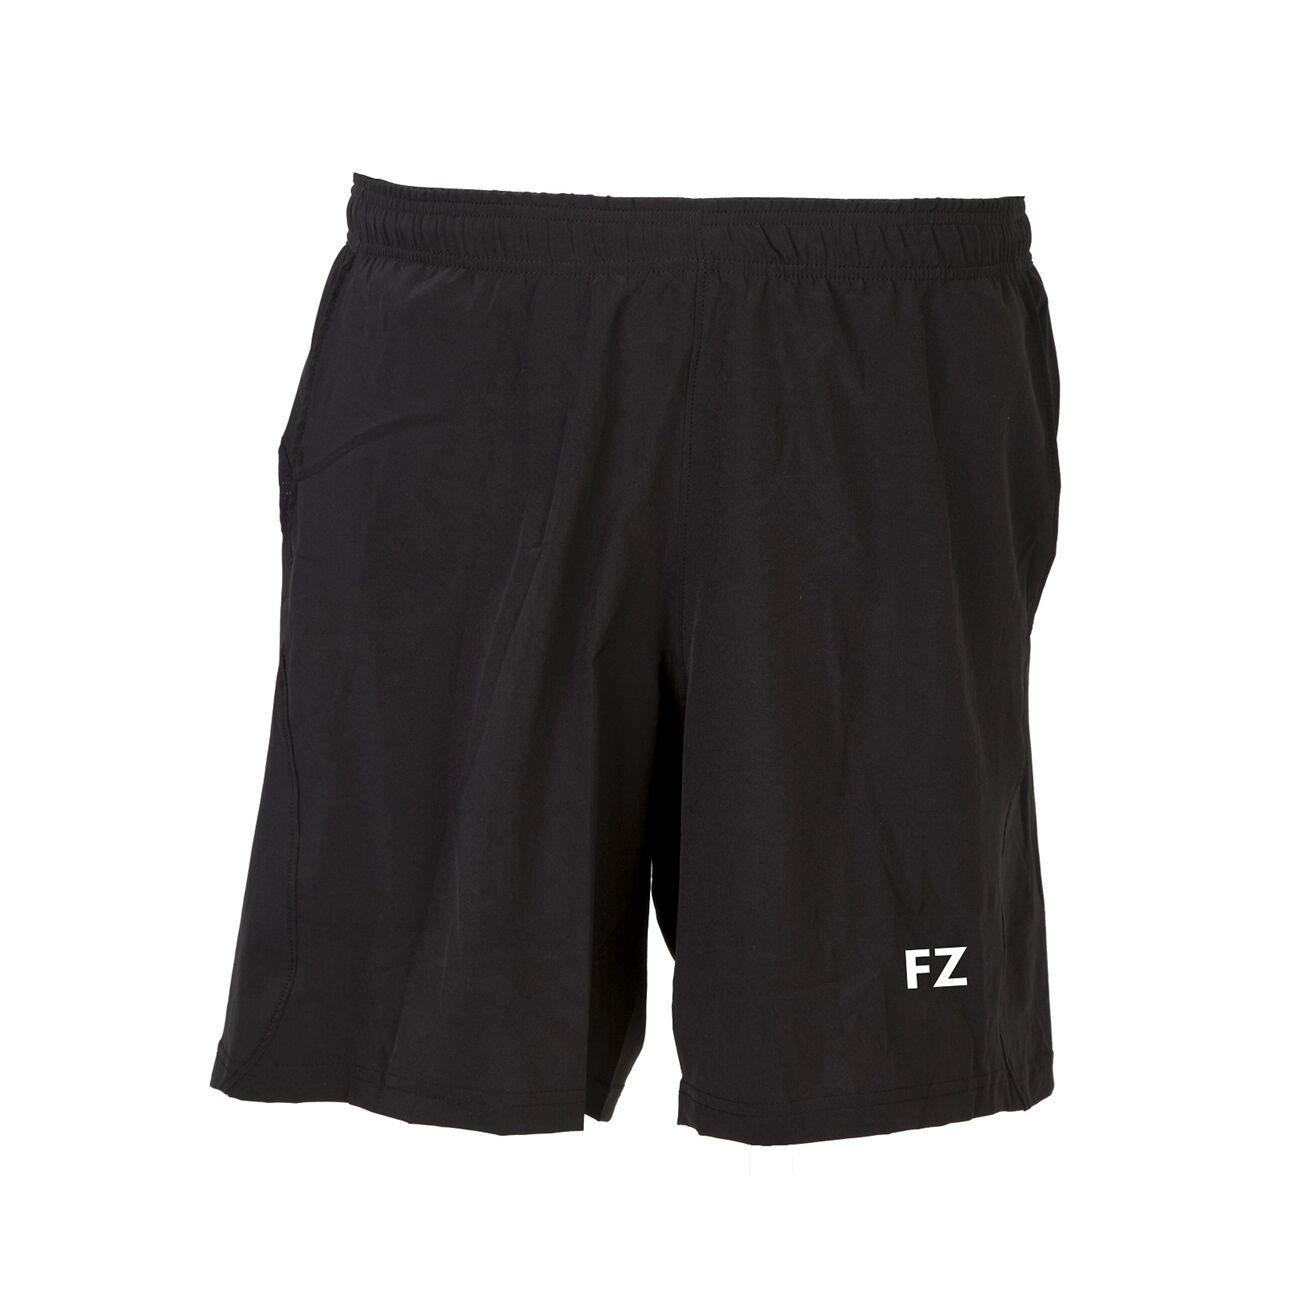 FZ Forza Ajax Shorts Men Black XL